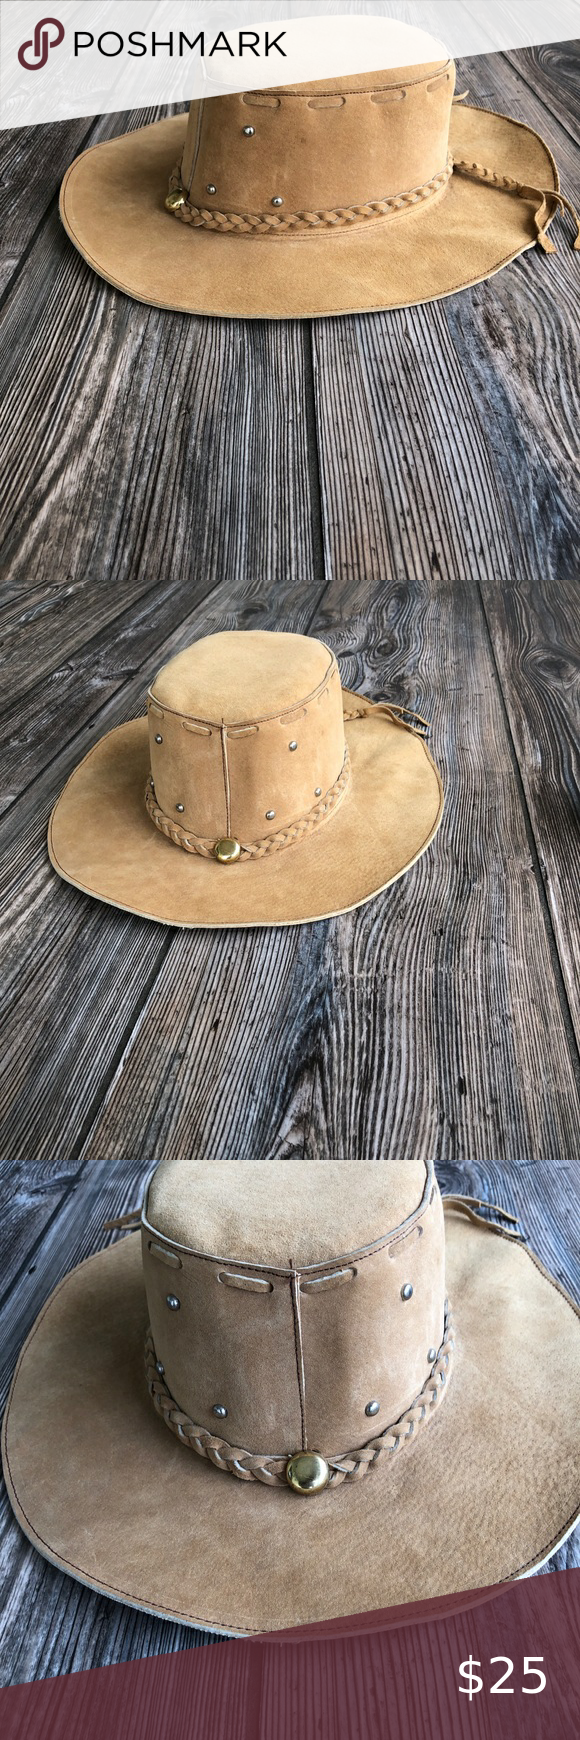 Tan Suede Texture Cowboy Hat W Braided Hat Band Leather Cowboy Hats Cowboy Hats Hat Band